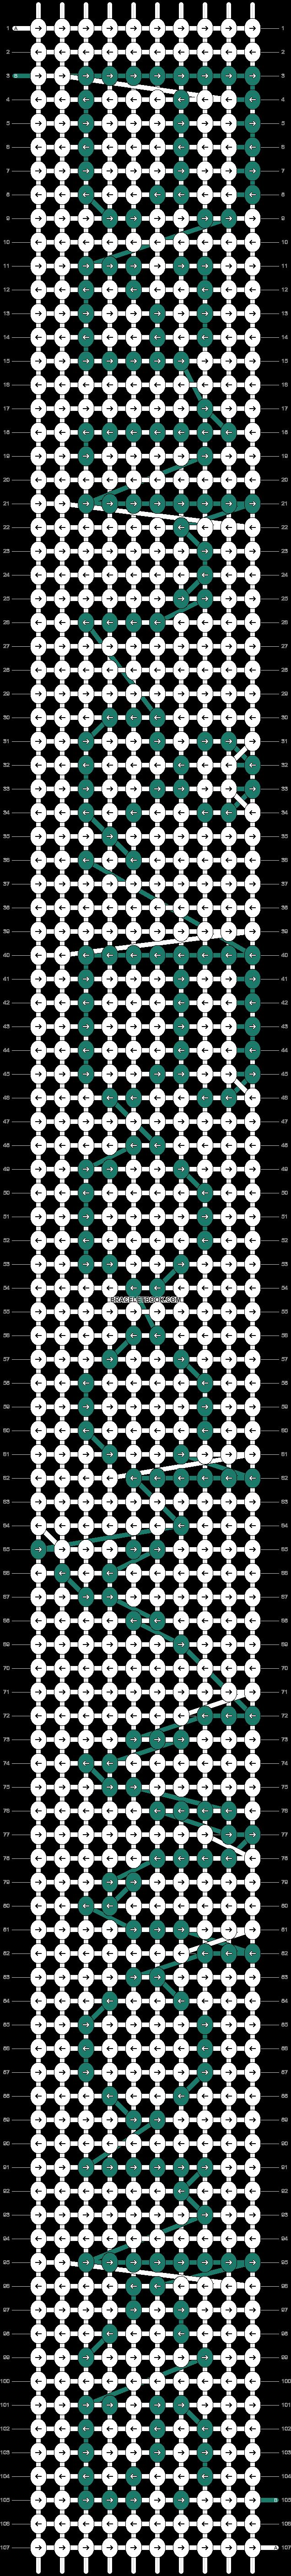 Alpha pattern #1446 pattern